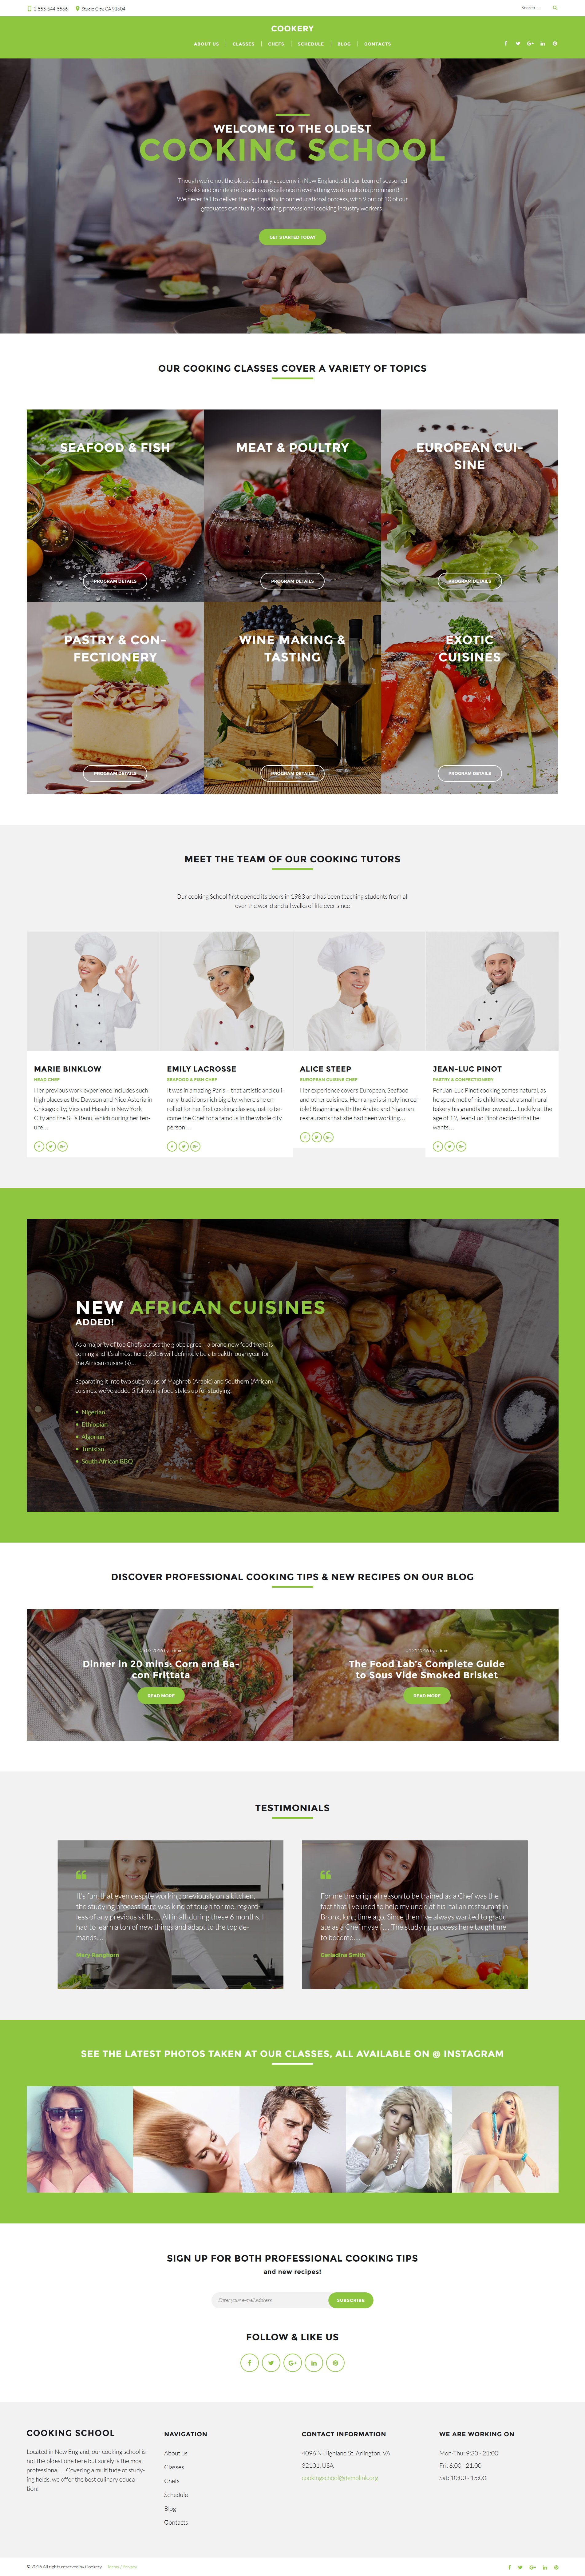 Cooking - Culinary School Responsive Tema WordPress №60130